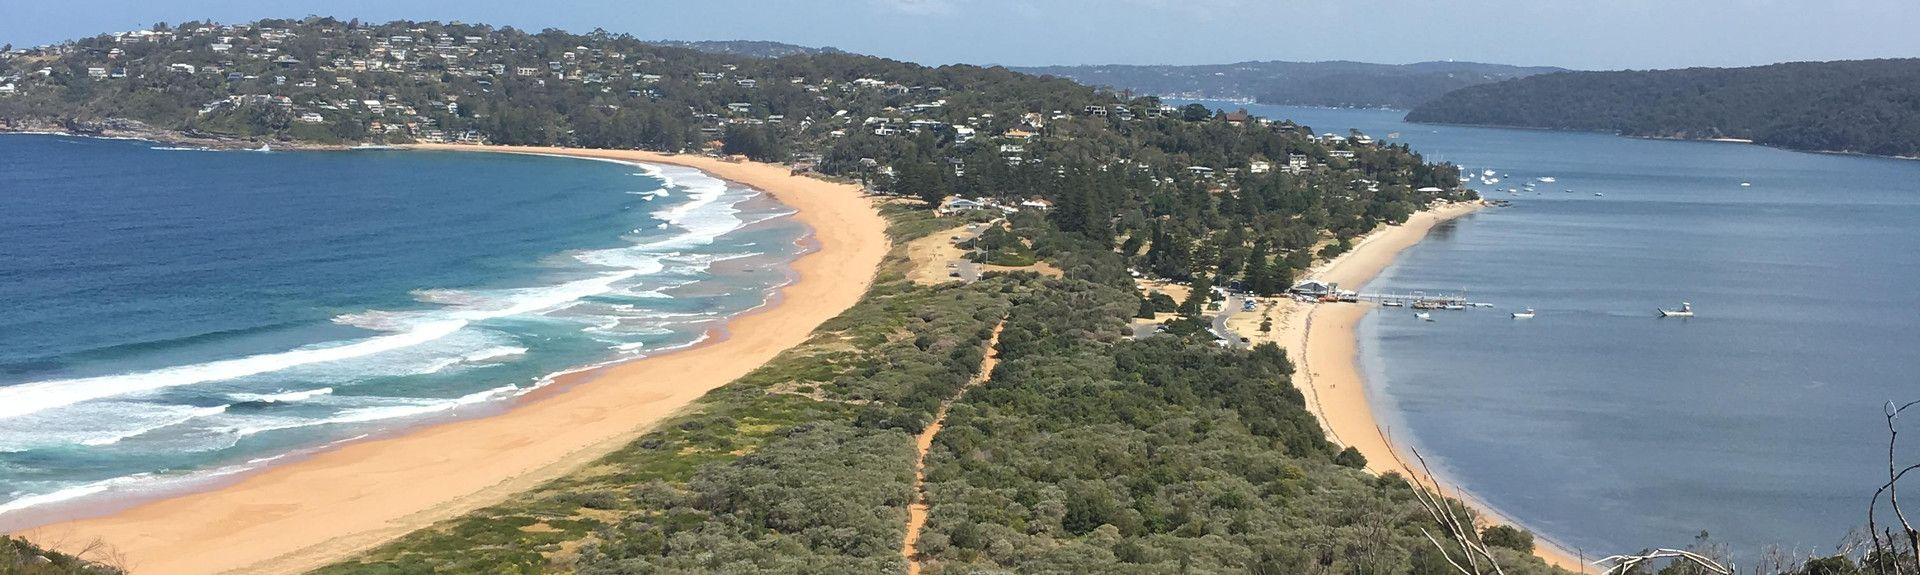 Lovett Bay, NSW, Australia